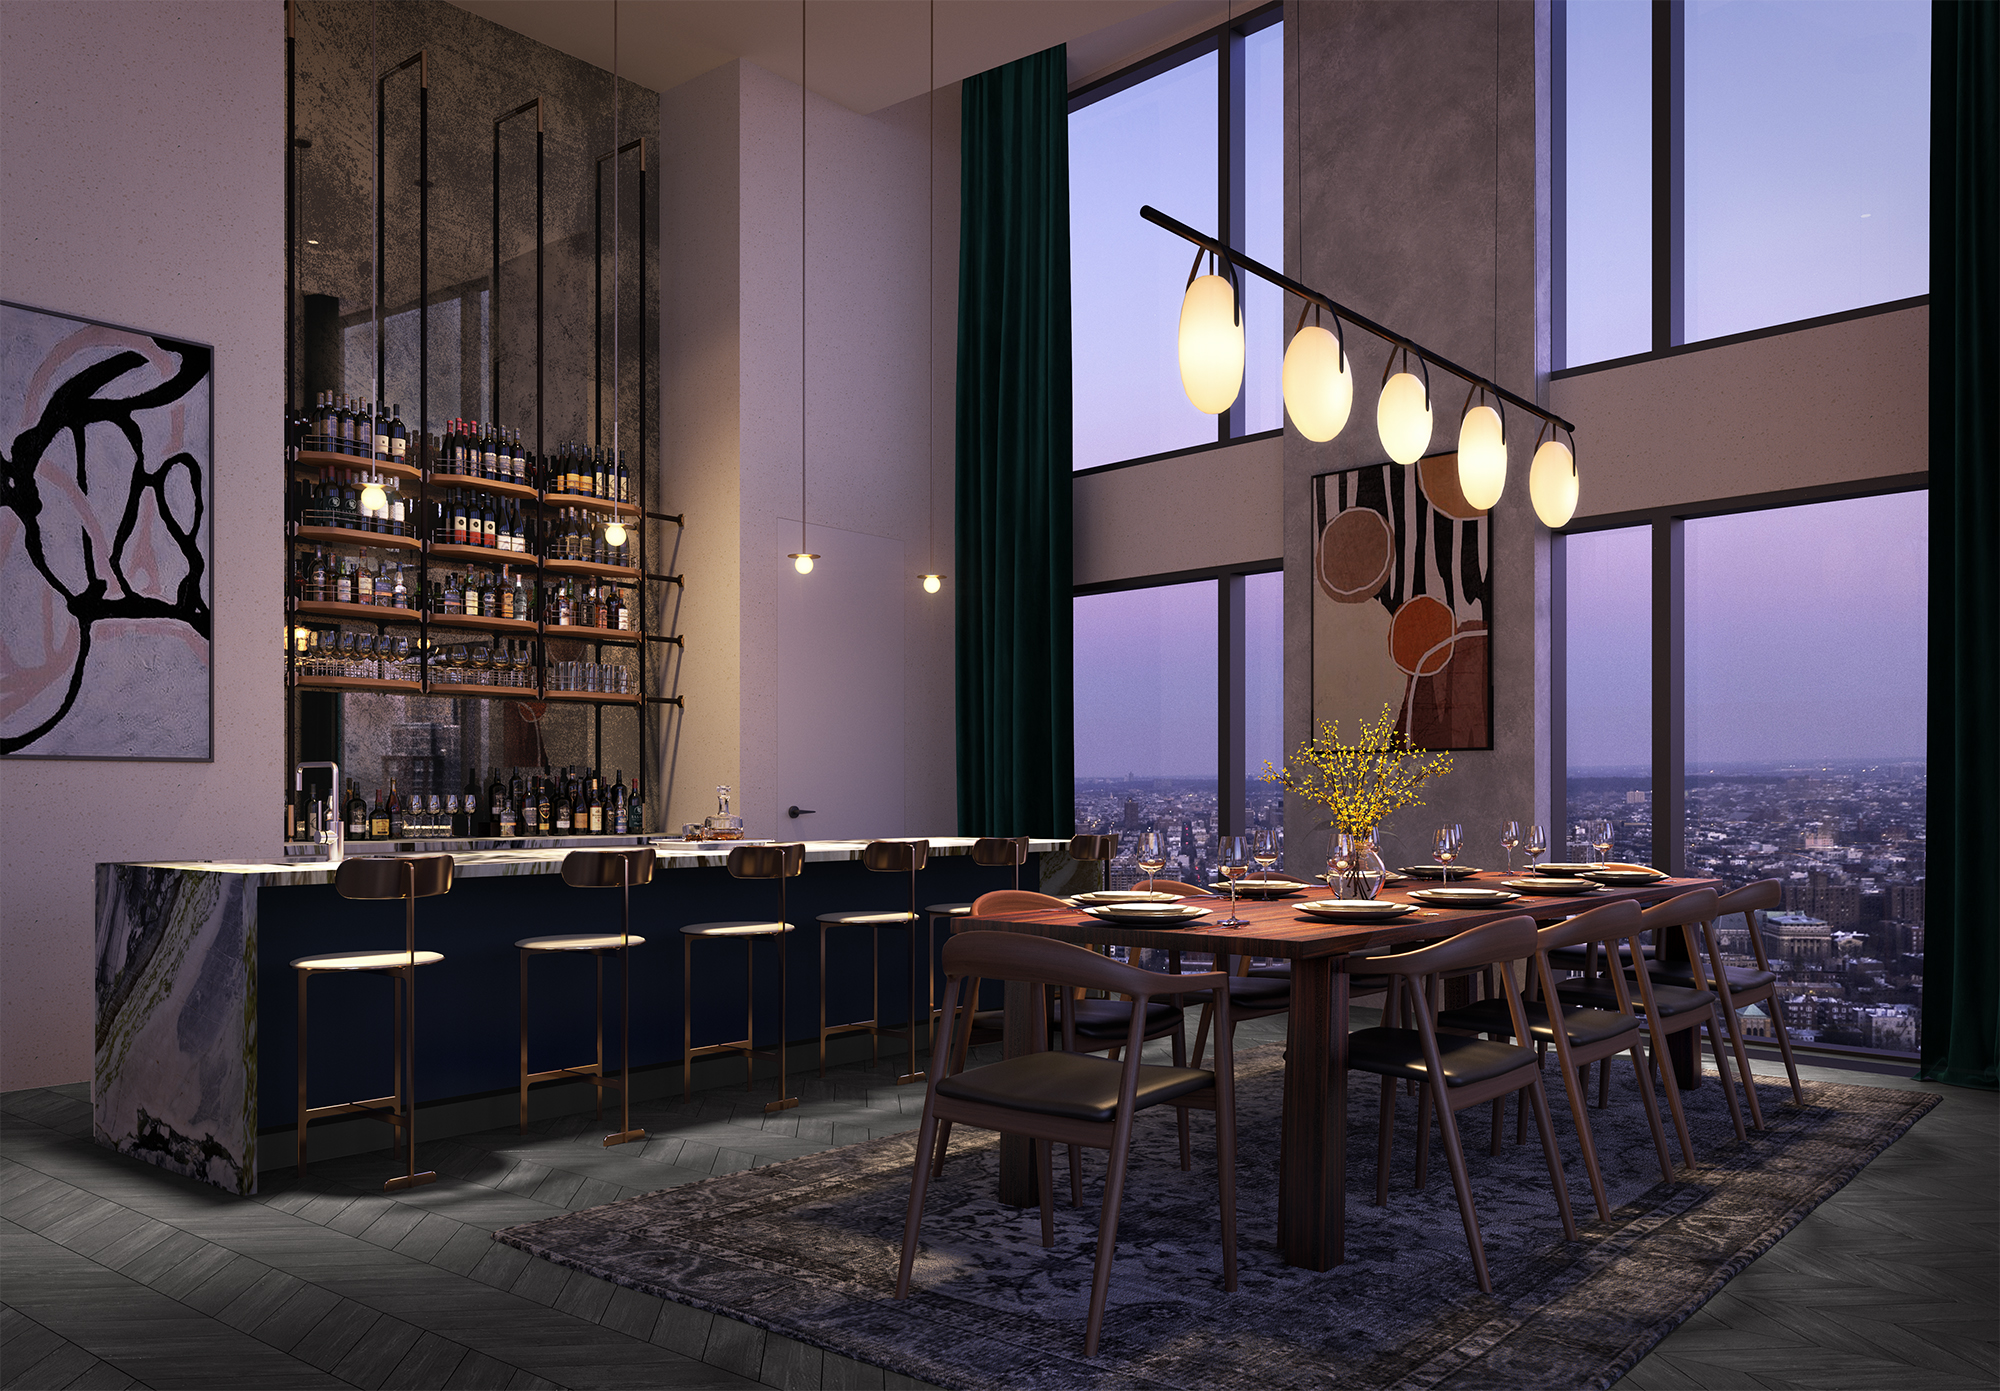 Studio Gang's Downtown Brooklyn condo unveils amenities like cinema, music studio